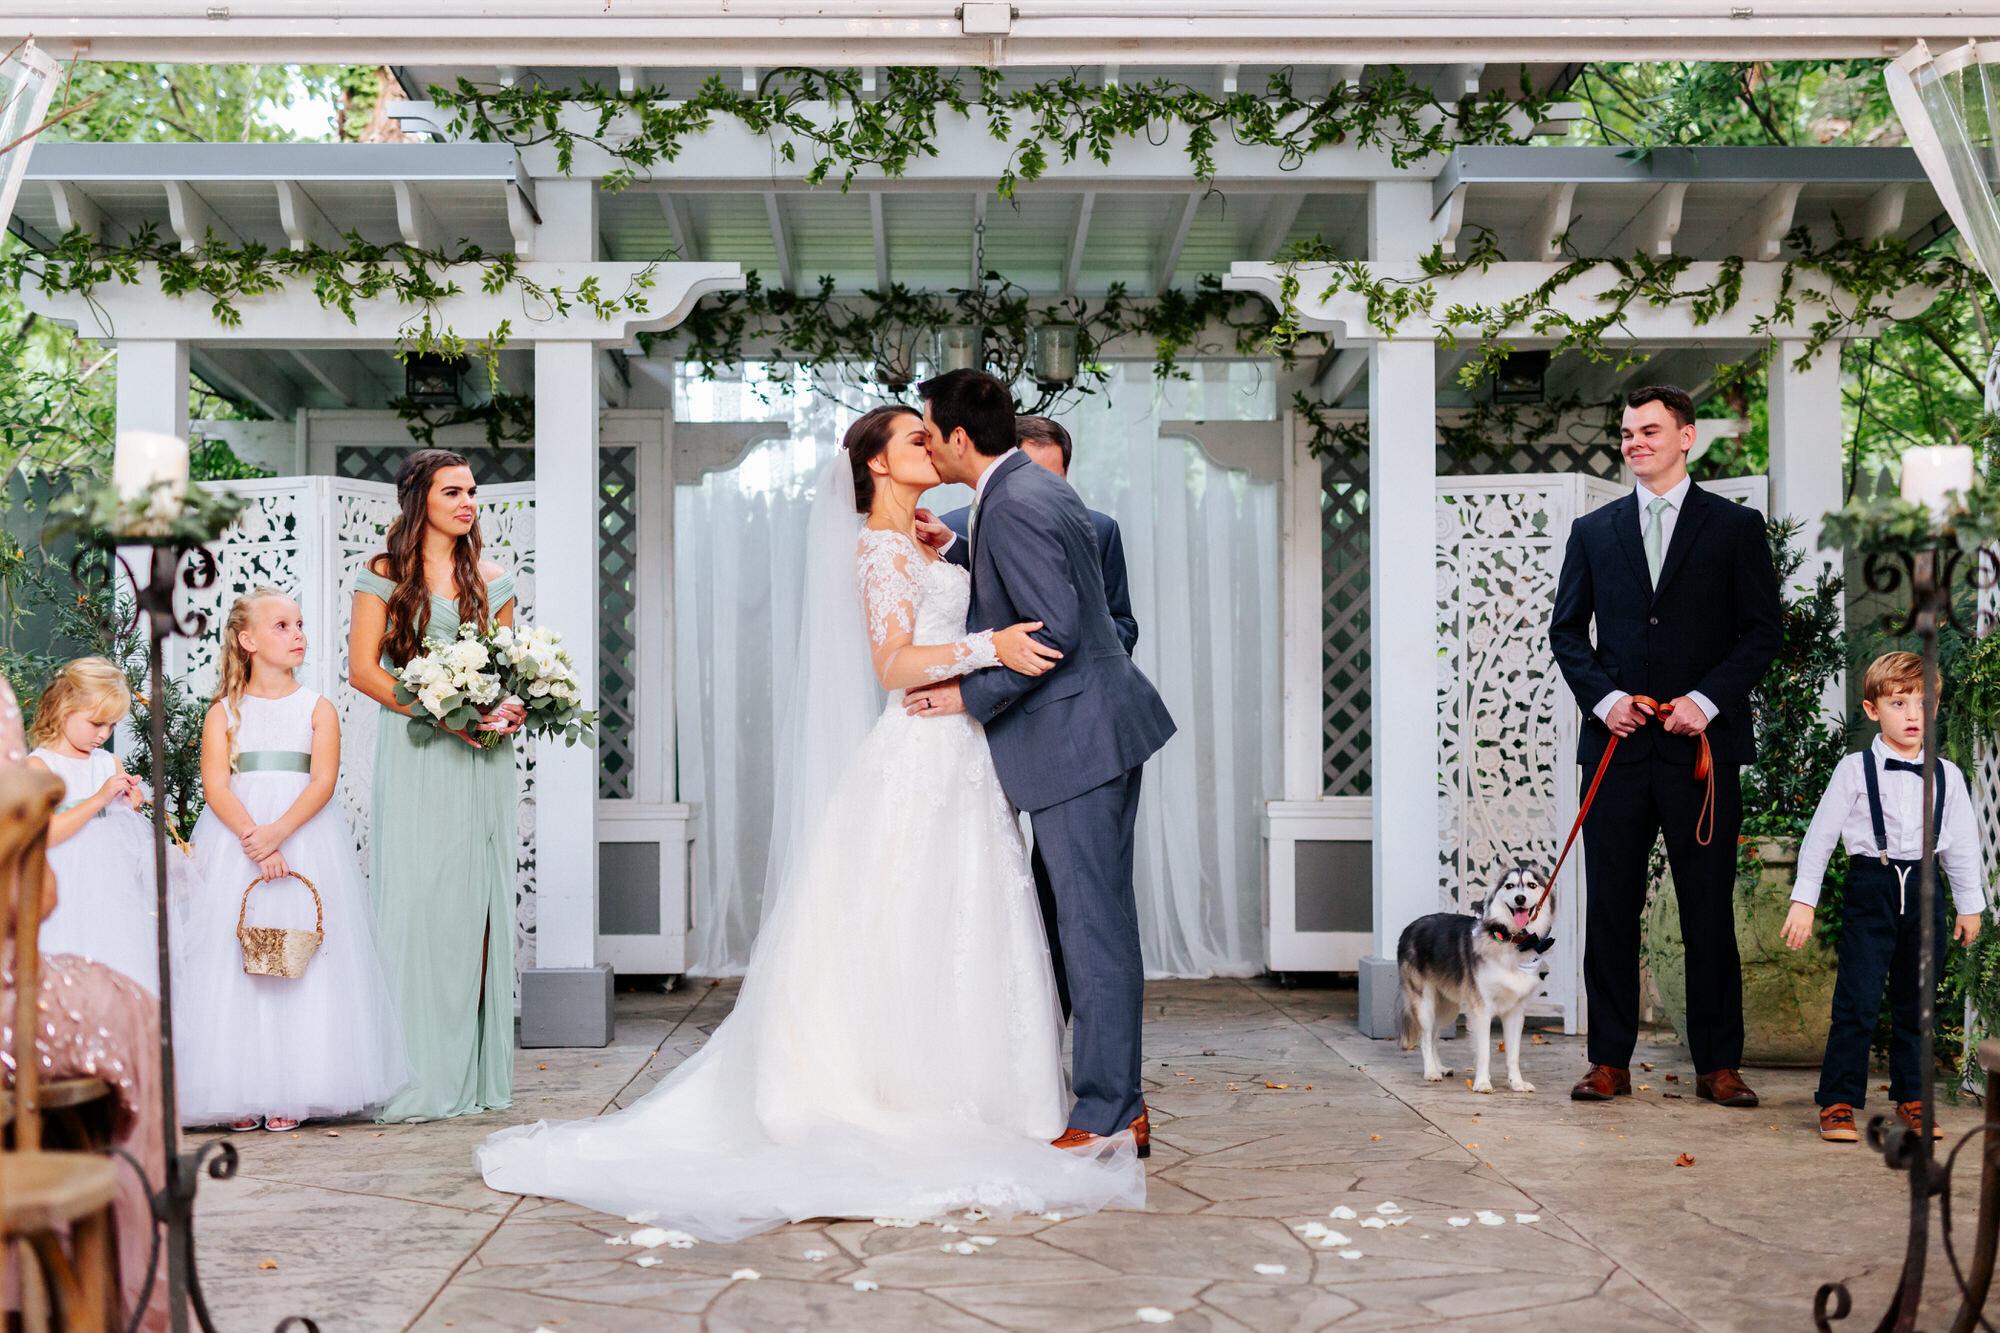 twigs-tempietto-wedding-greenville-downtown-350.JPG